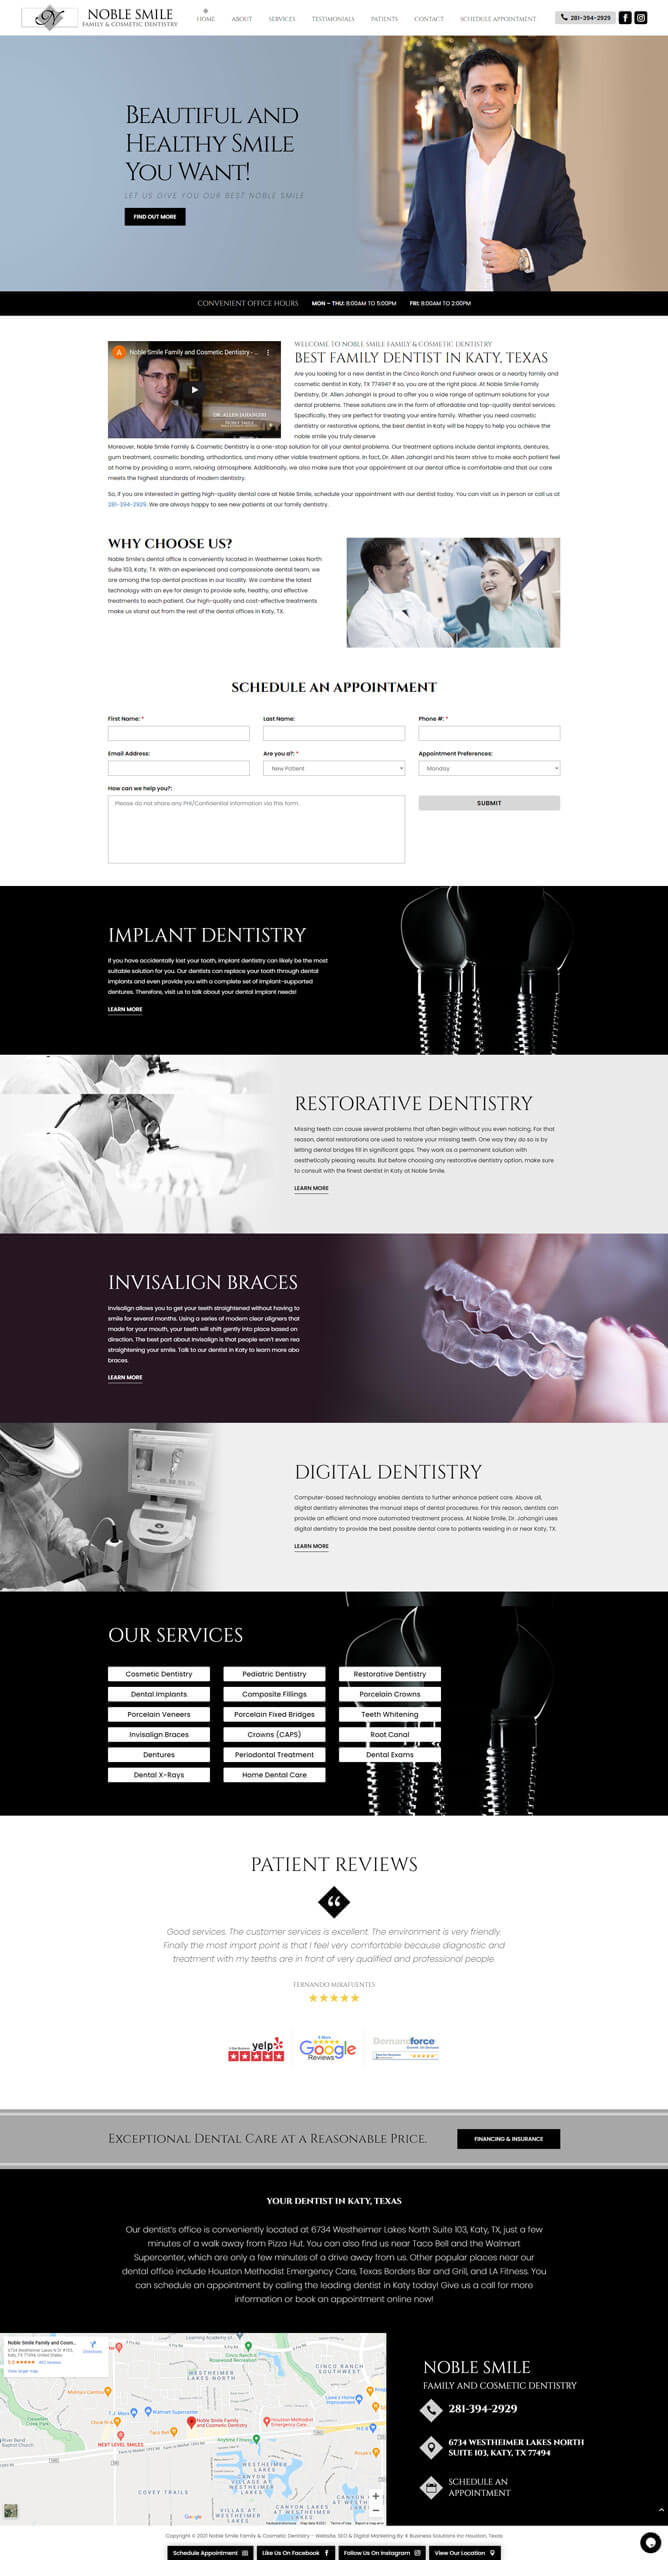 Noble Family Dentistry